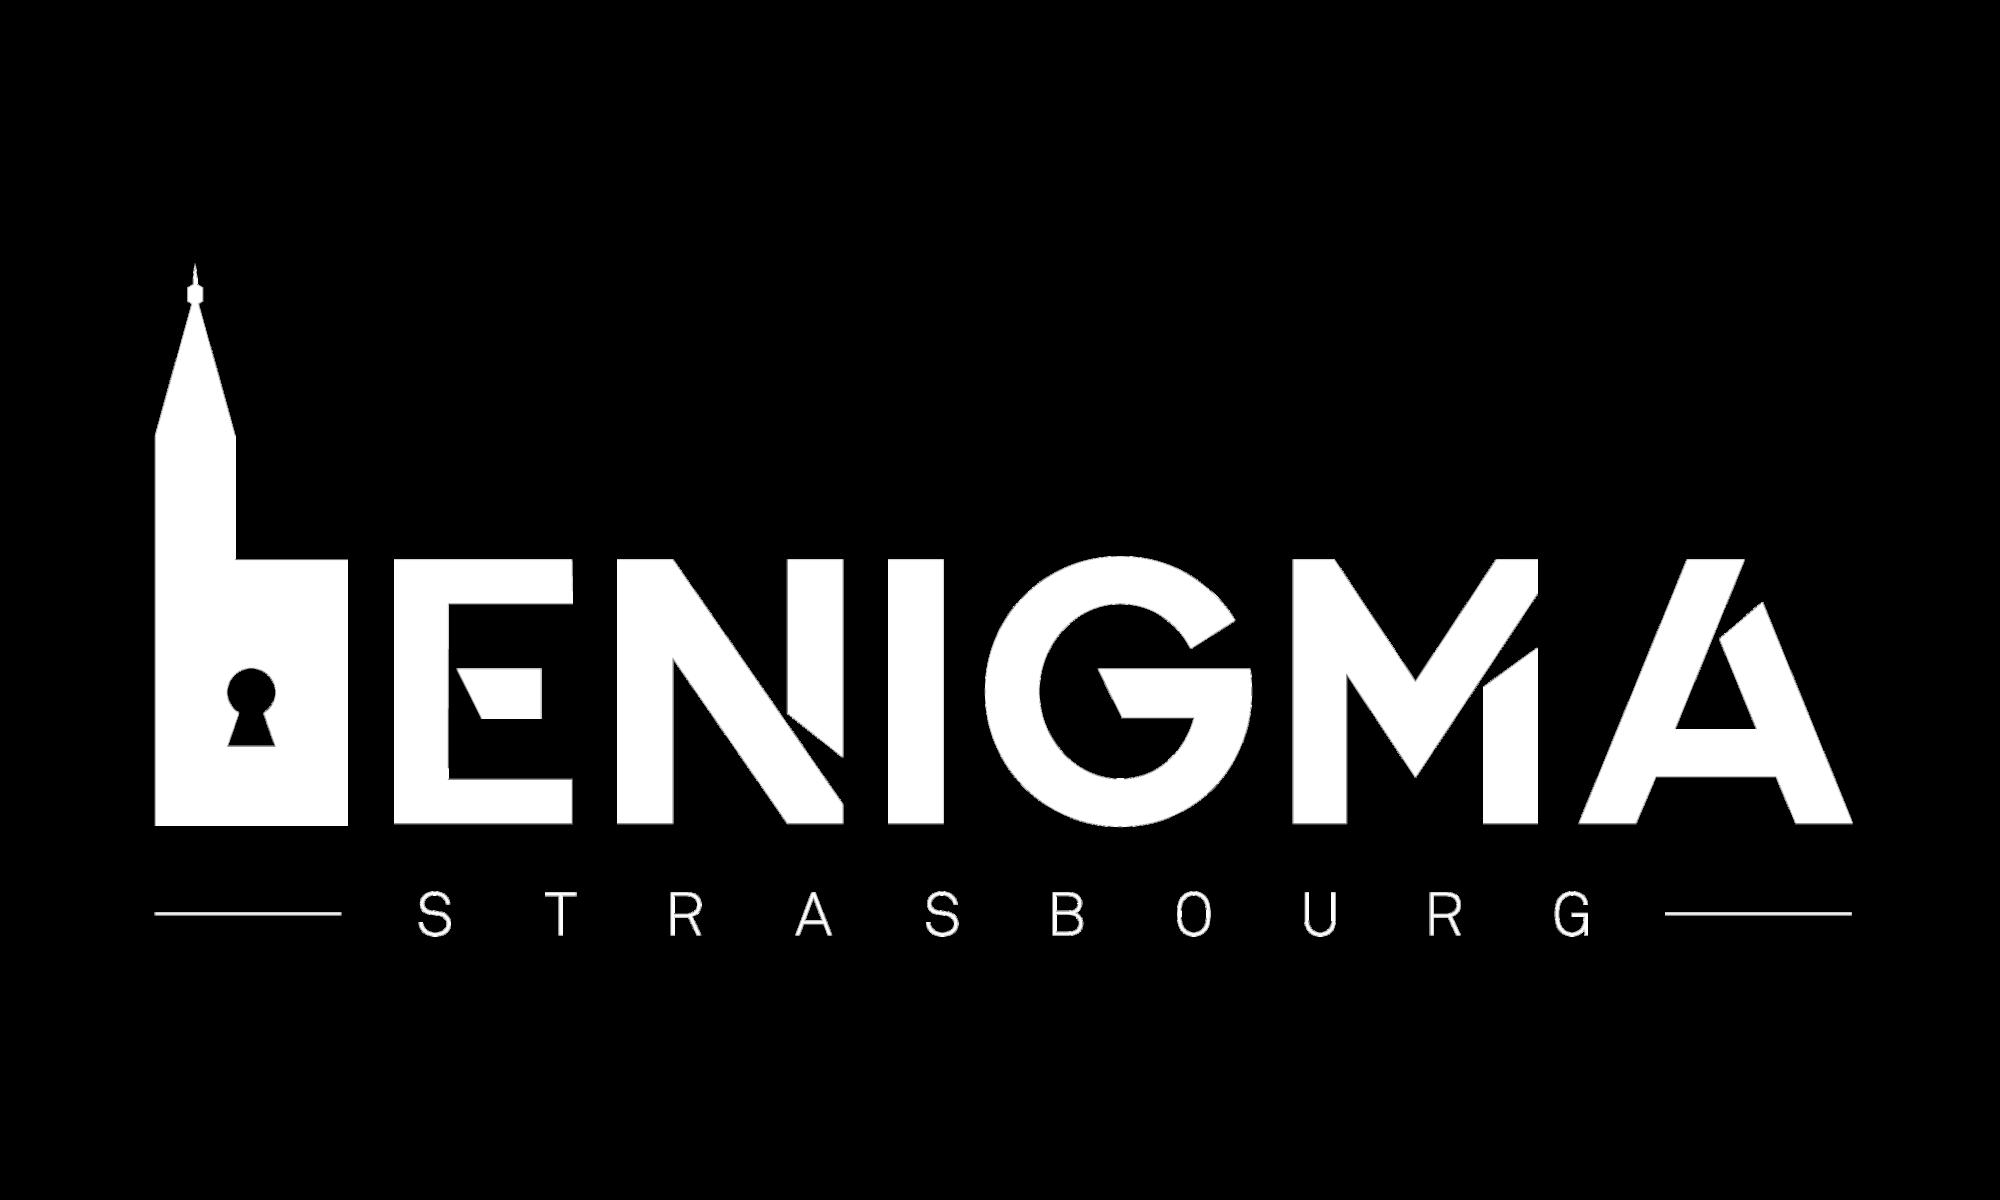 ENIGMA Strasbourg